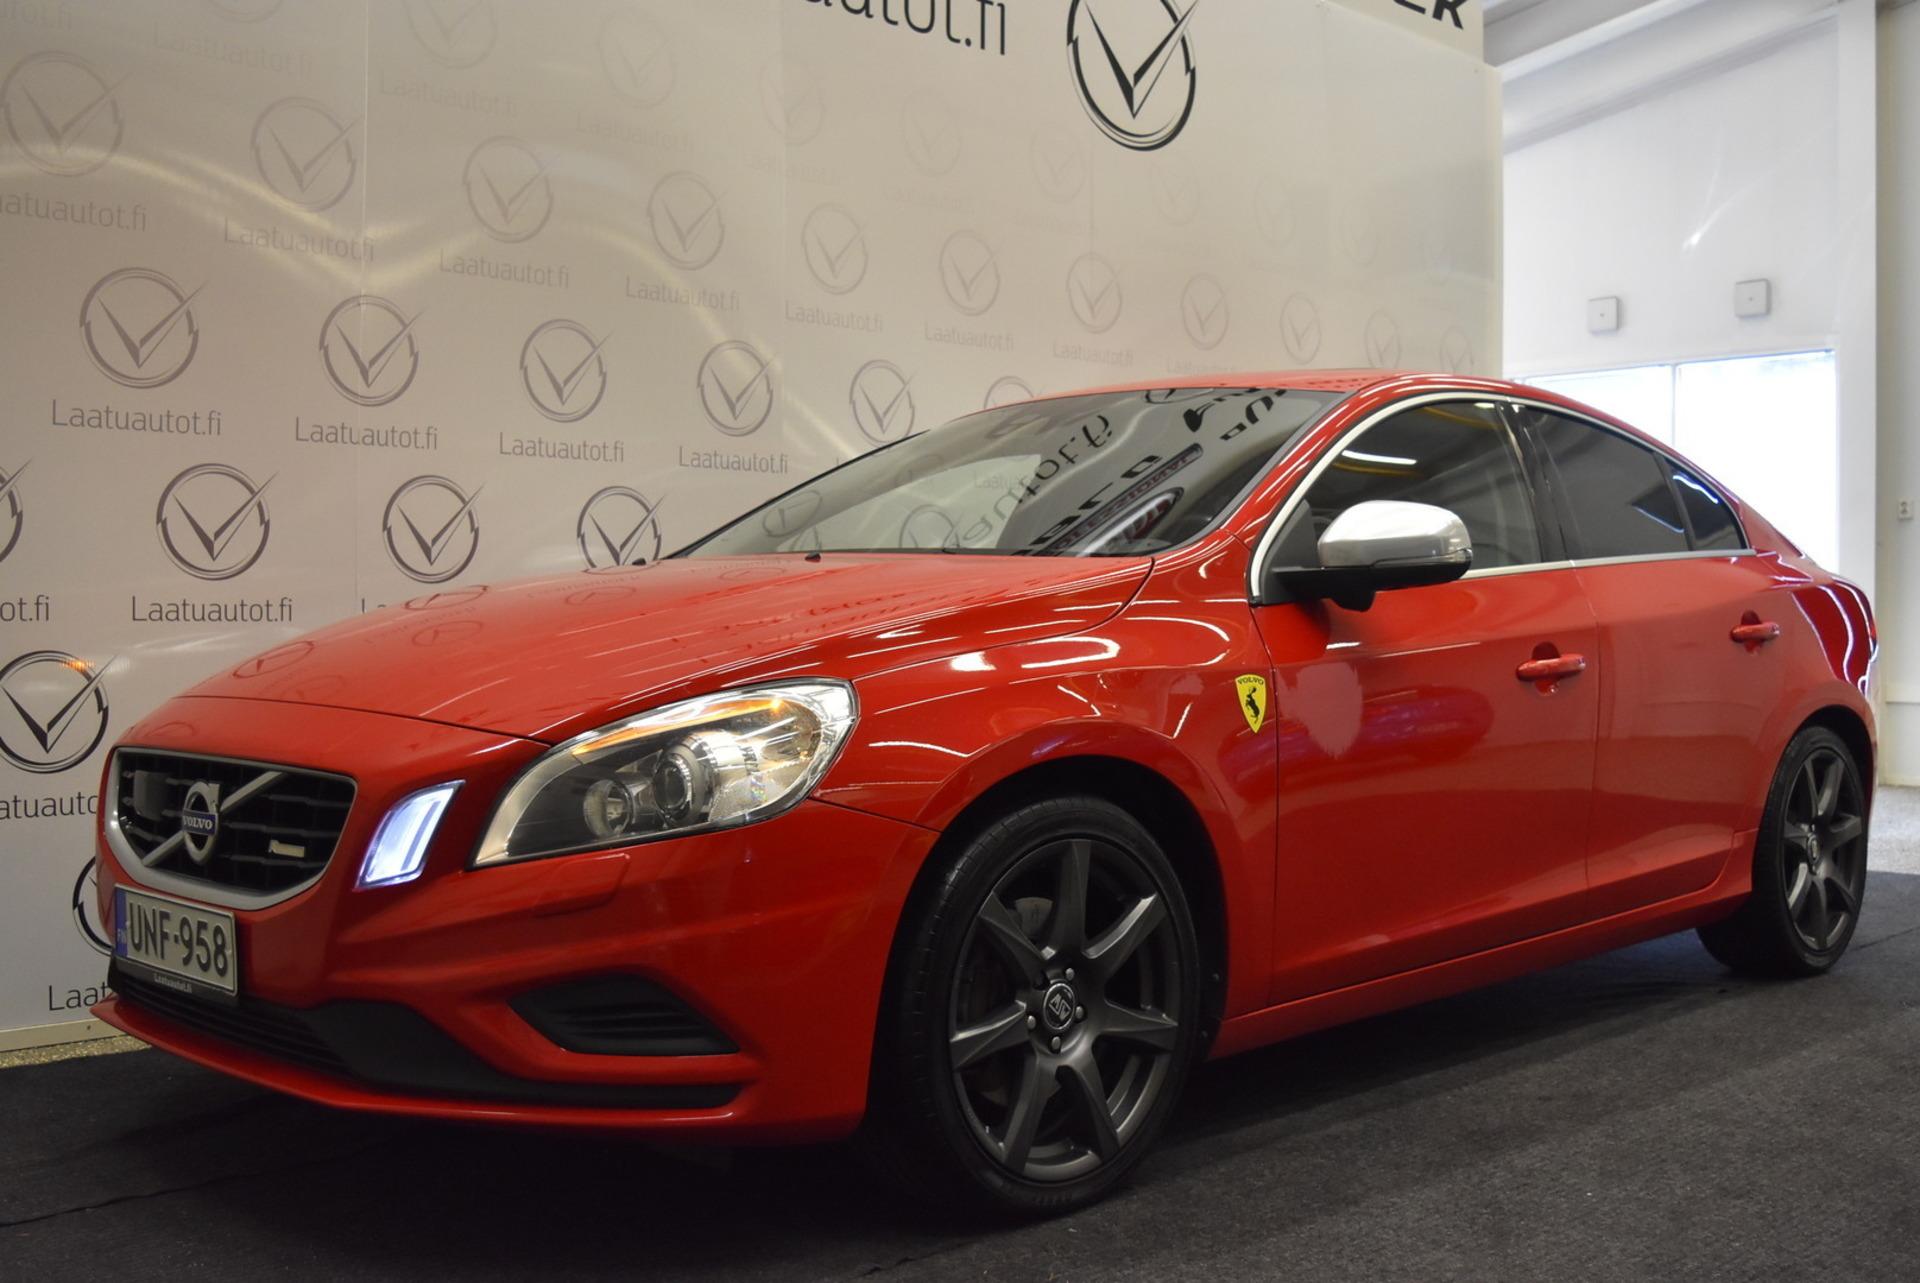 VOLVO S60 D5 AWD R-Design aut - ,  Korko 1, 99%! Navi,  Adap.cruise,  Lisälämmitin,  Lasikattoluukku,  Premium audio,  BLIS,  Ir.vetokoukku,  P.kamera jne!!